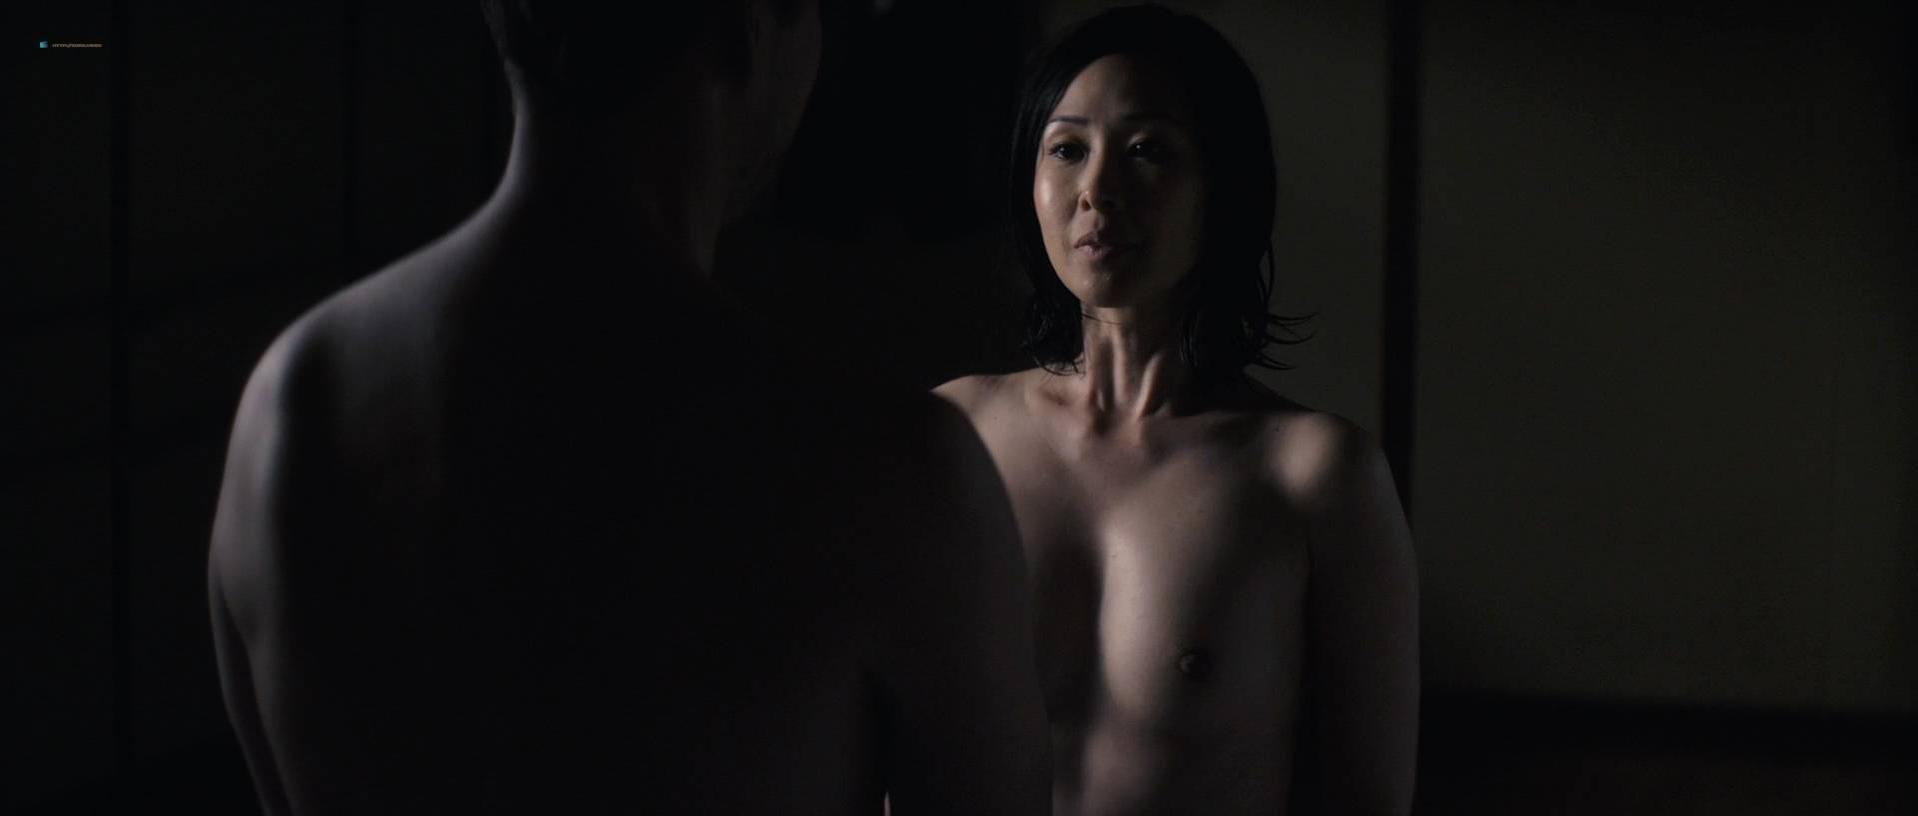 Charlotte Le Bon nude, Linh Dan Pham nude, Valerie Donzelli sexy, Lea Drucker sexy - Le grand mechant loup (2013)